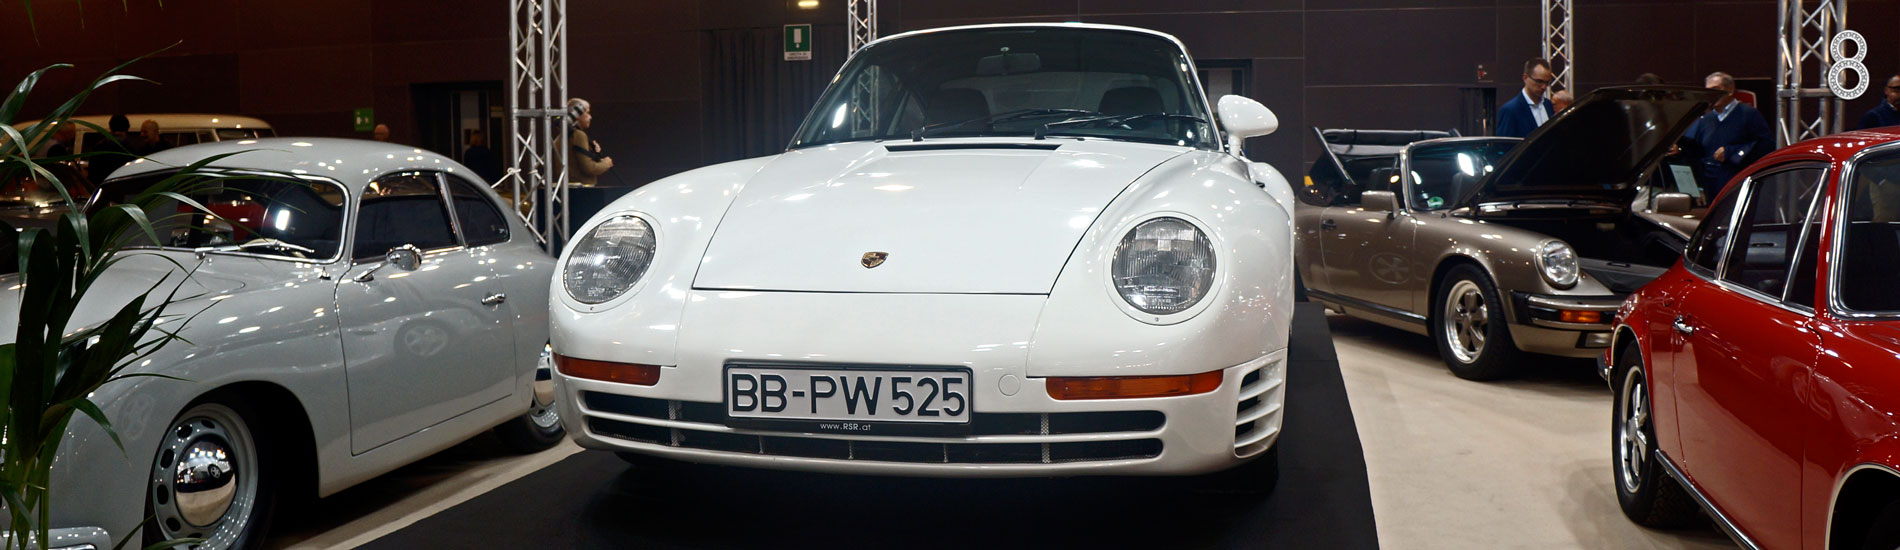 Porsche 959 - Cover (c) Ciclootto.it